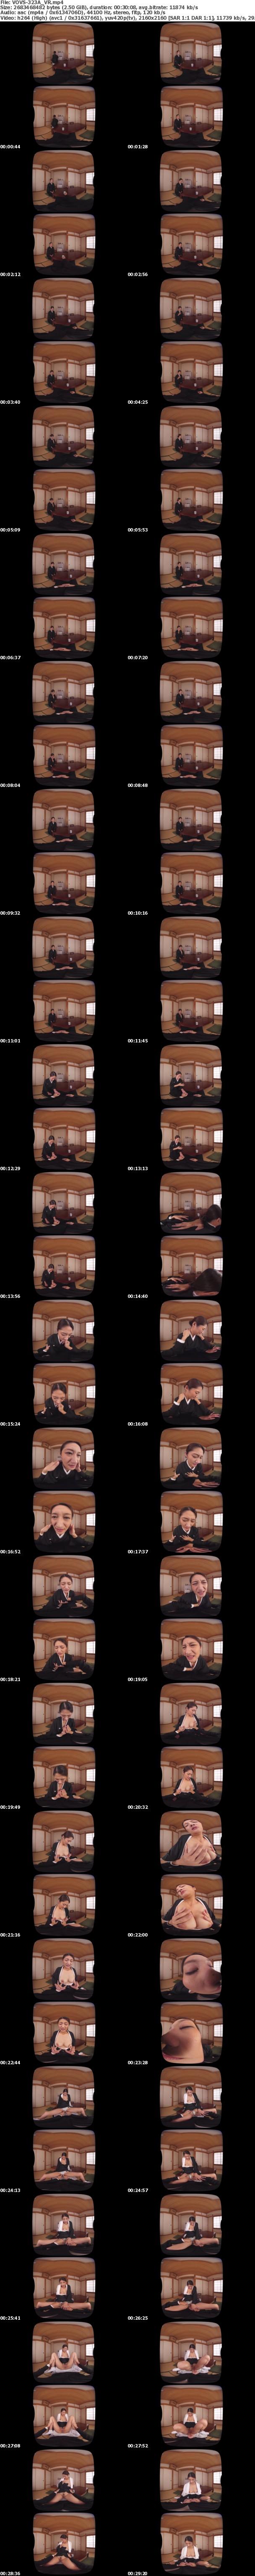 VR/3D VOVS-323 【VR】長尺47分・高画質 滝本エレナ 許して、アナタ…。背徳の未亡人